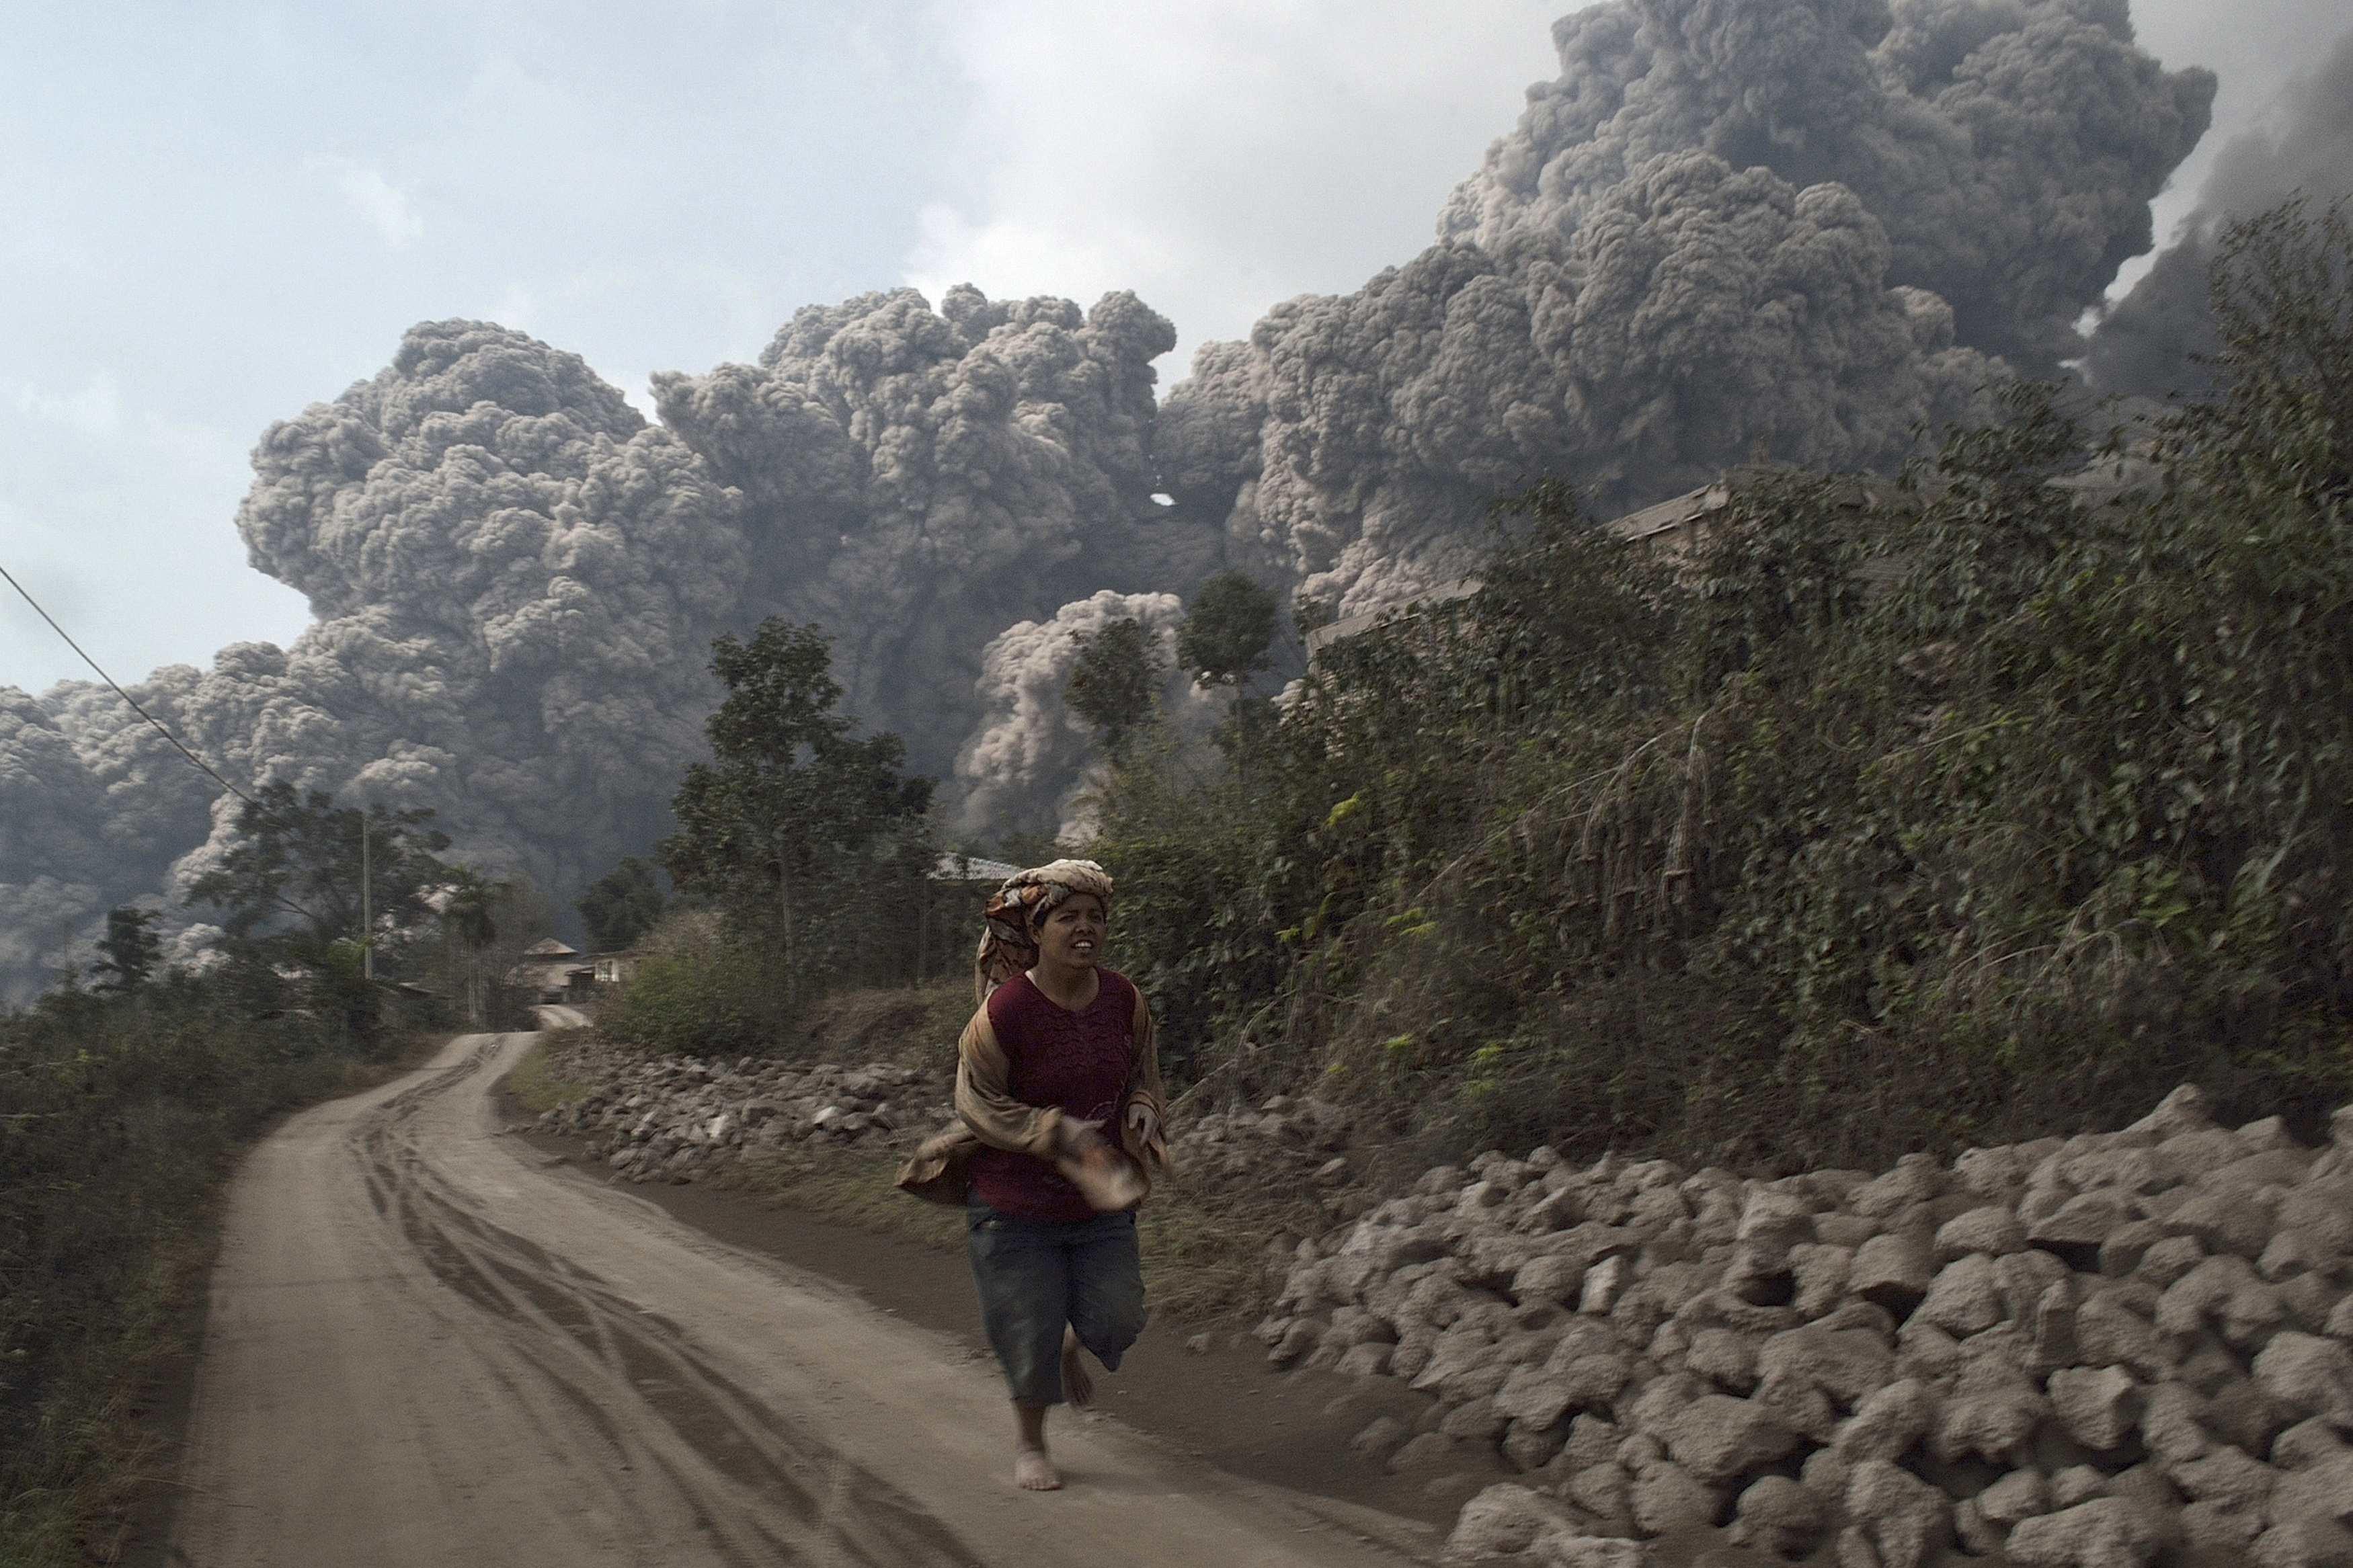 A villager run as Mount Sinabung erupt at Sigarang-Garang village in Karo district, Indonesia's North Sumatra province, Feb. 1, 2014.